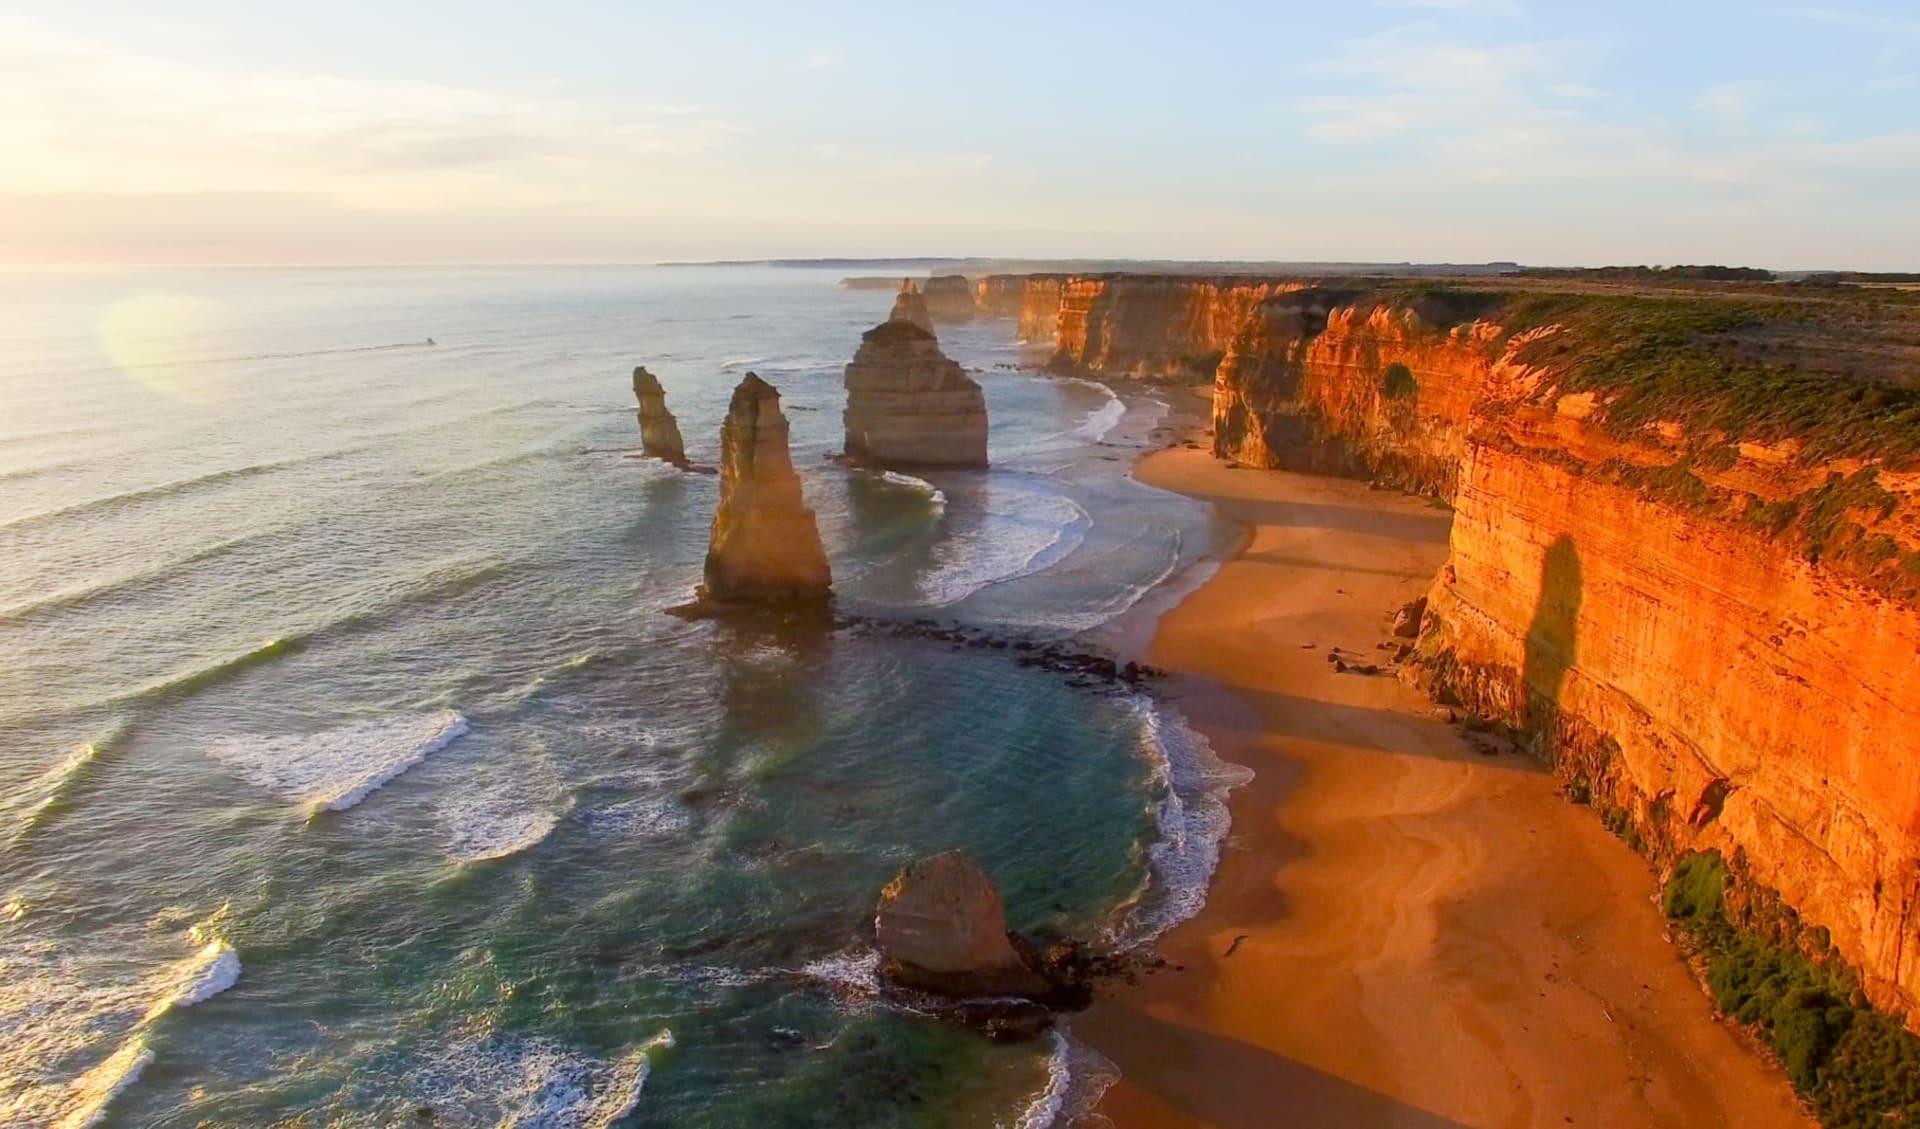 Melbourne to Darwin: Zwölf Apostel